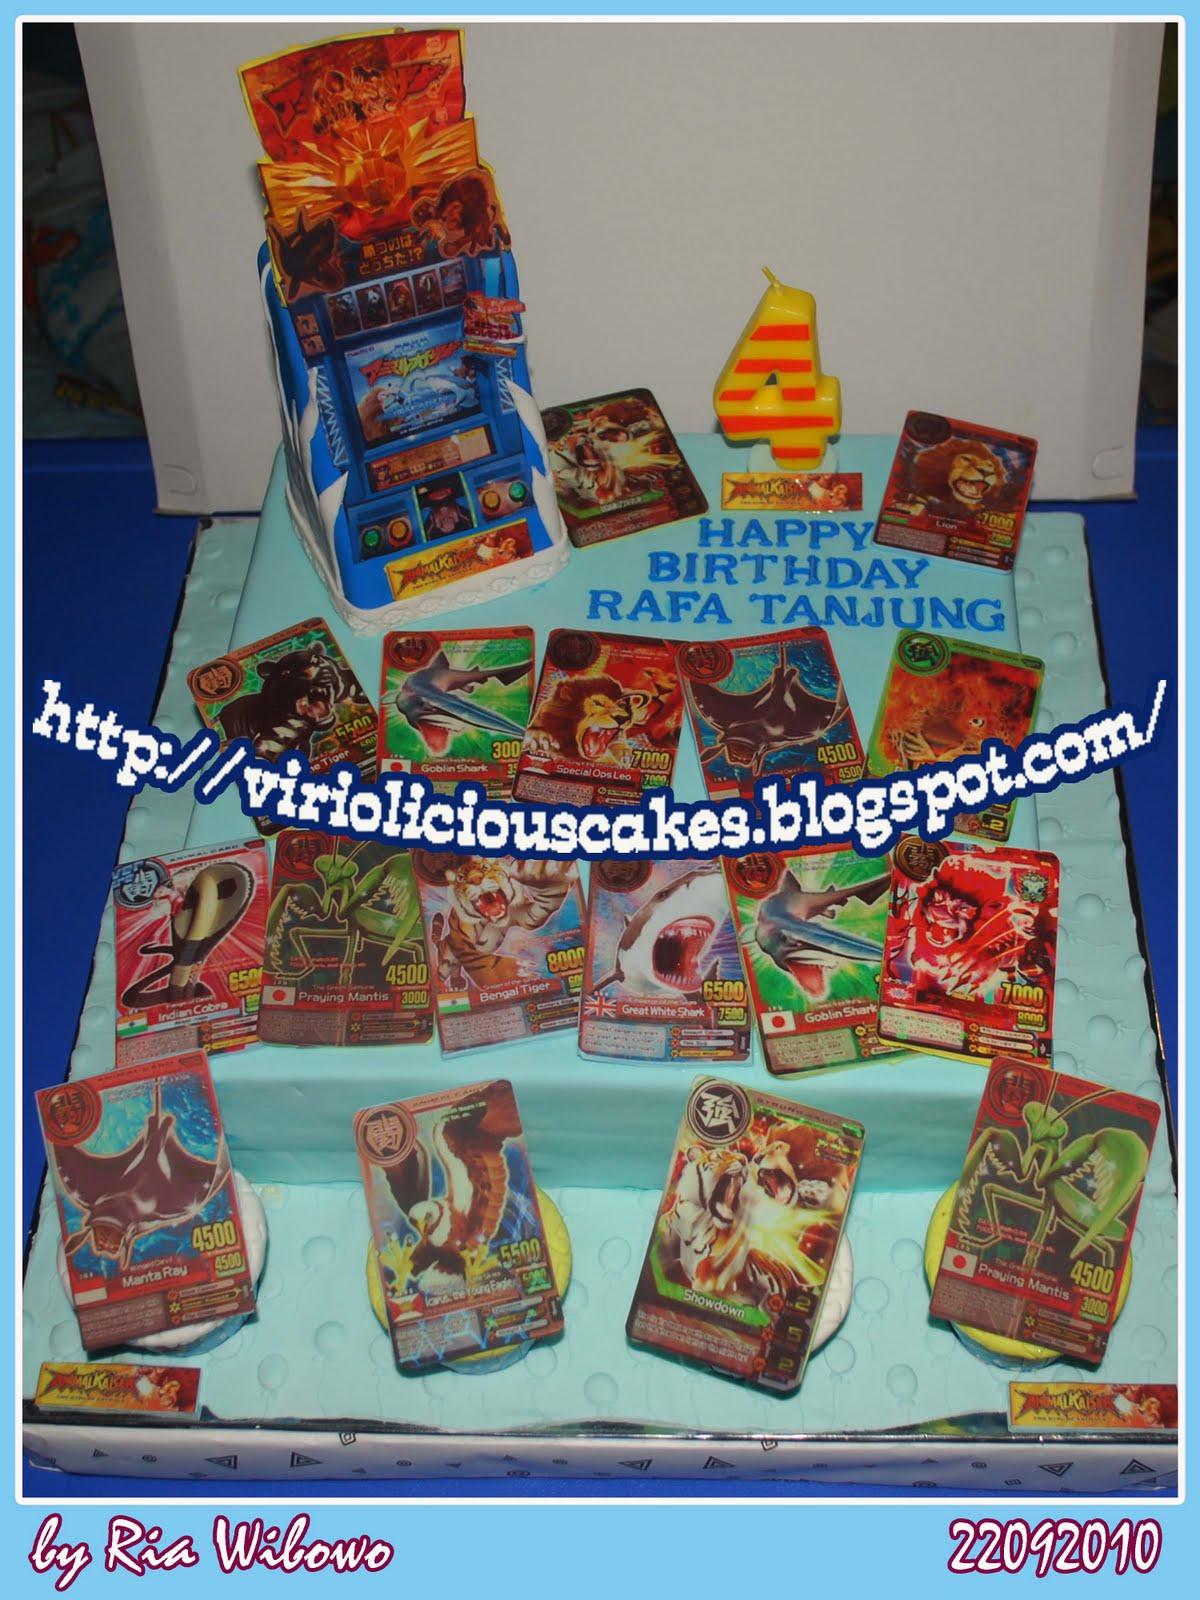 VIRIOLICIOUS CAKES ANOTHER CAKE FOR RAFA THE ANIMAL KAISER CAKE